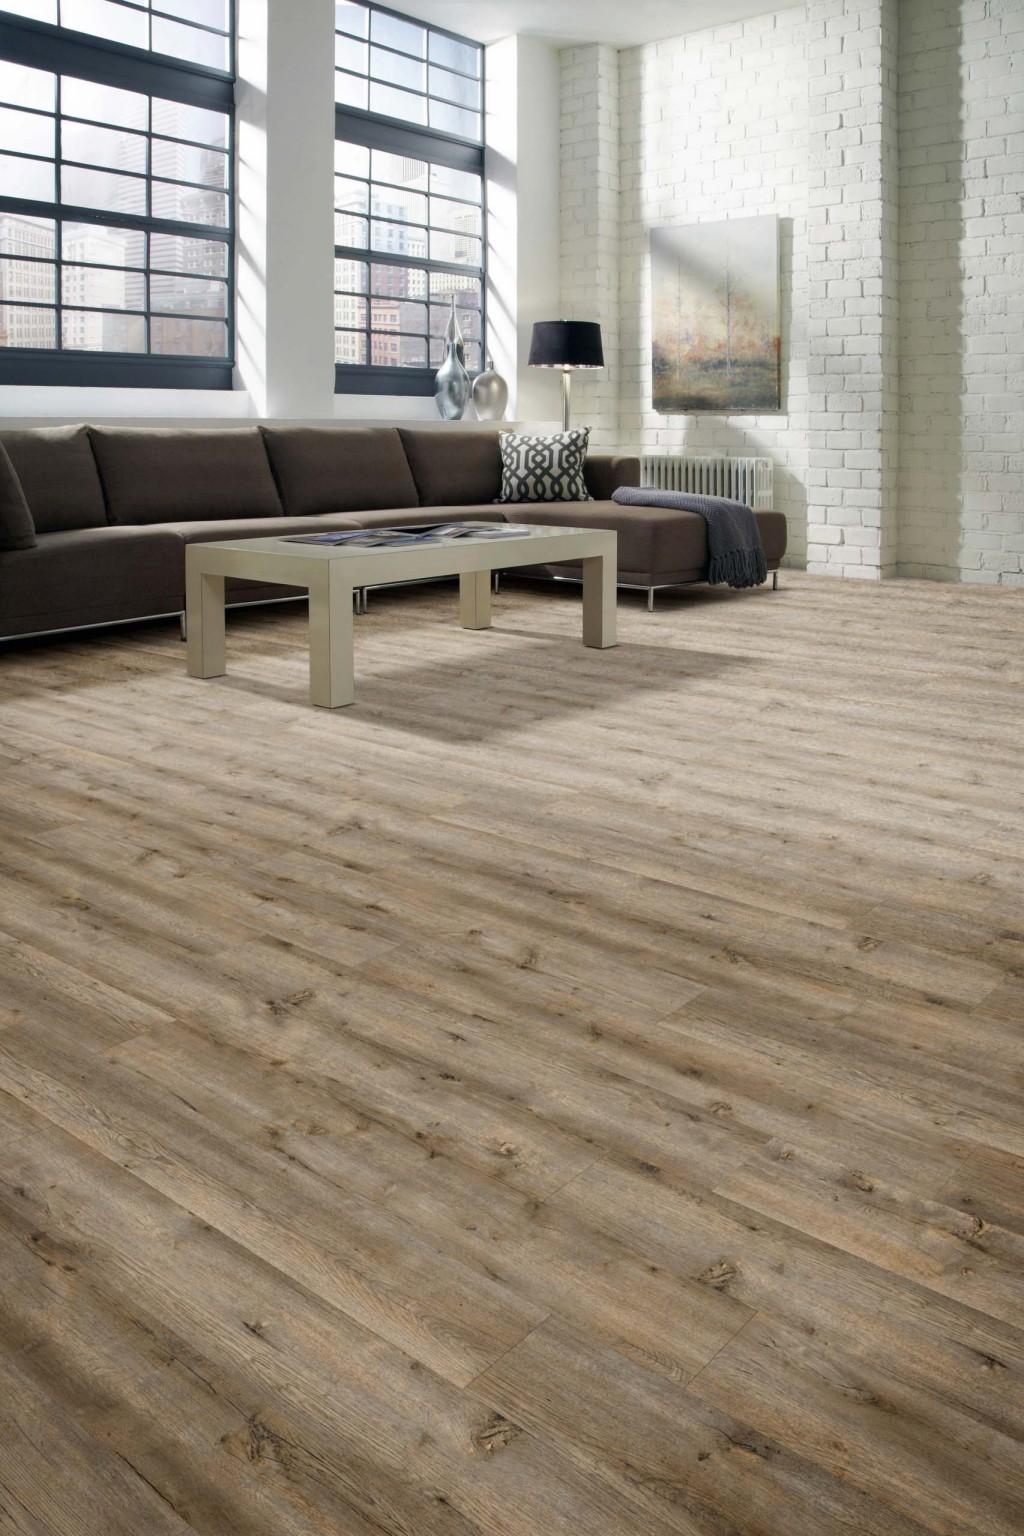 Maldives Male Oak Lvt Flooring Tapi Carpets Amp Floors